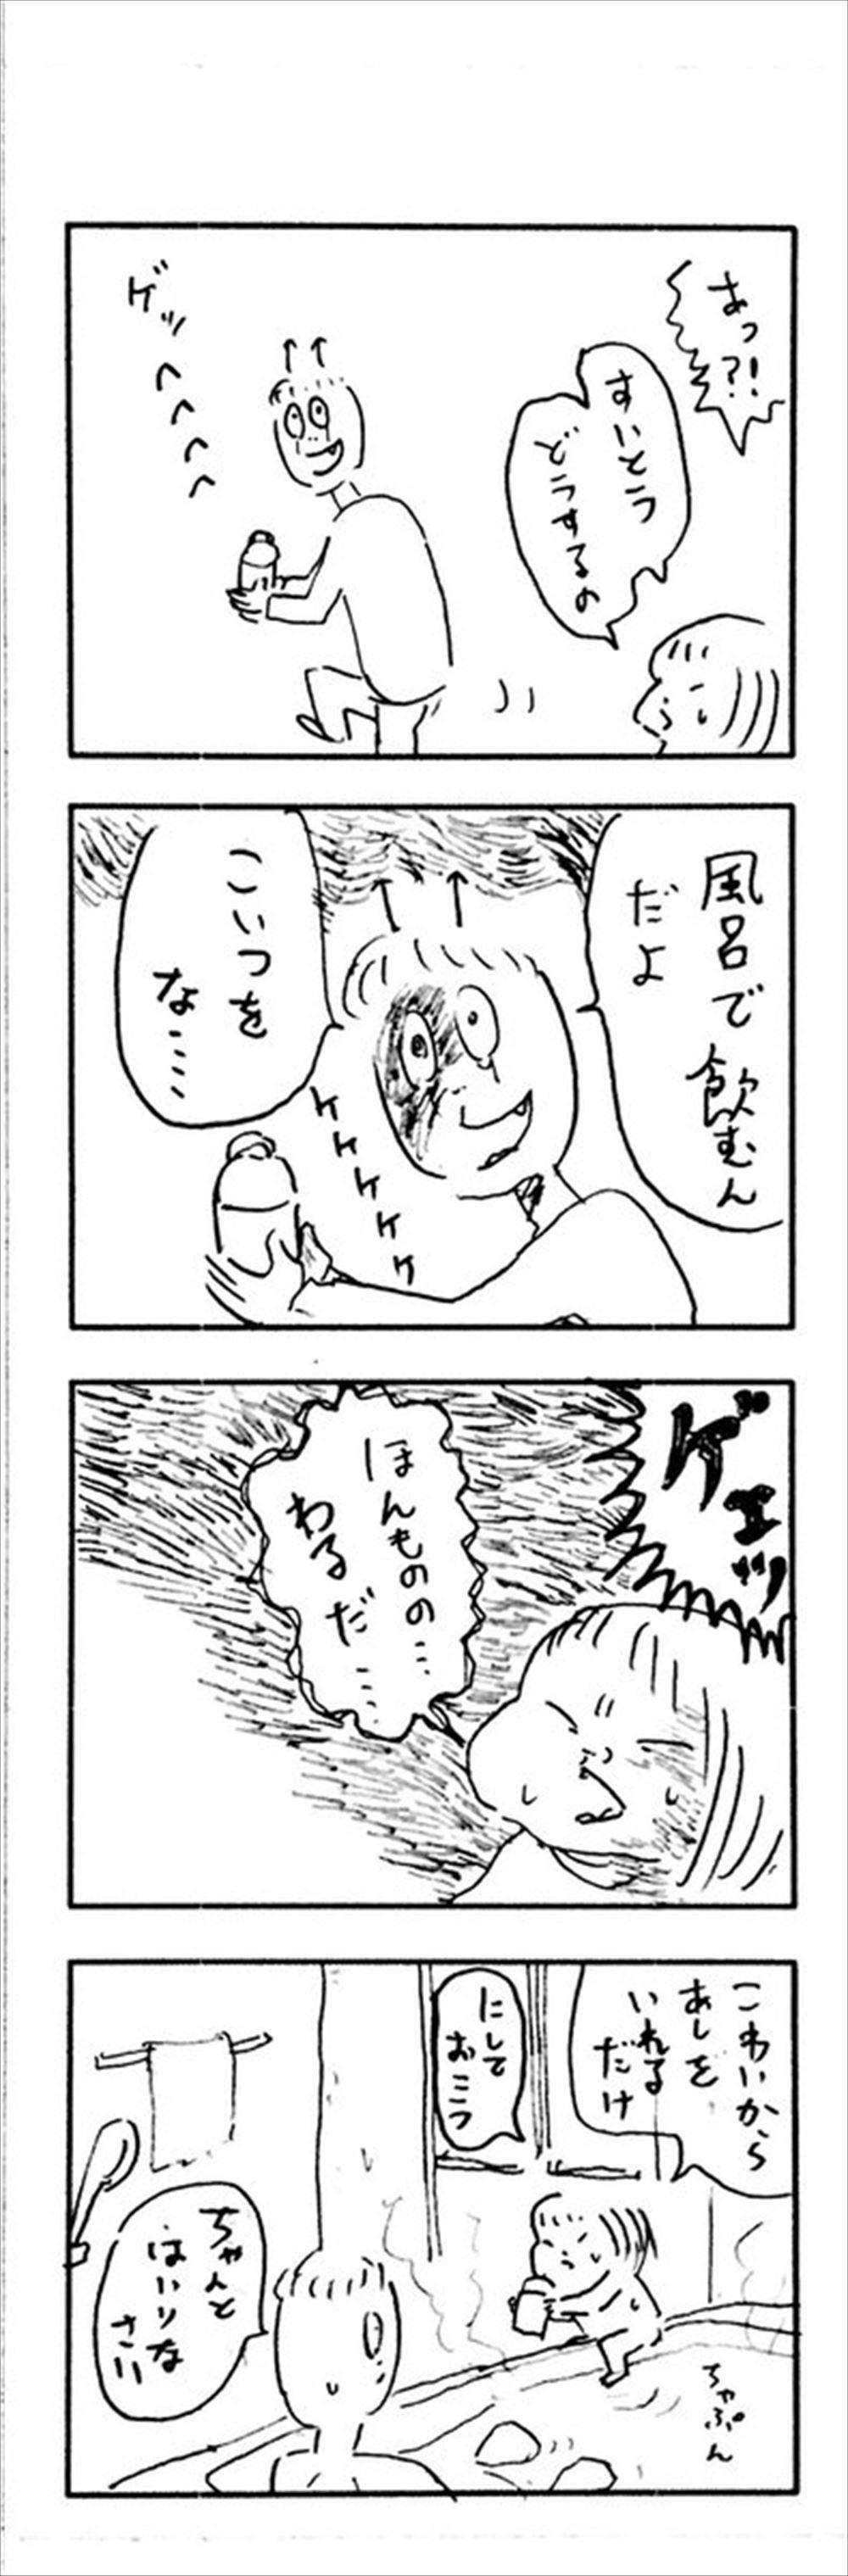 悪事3_R